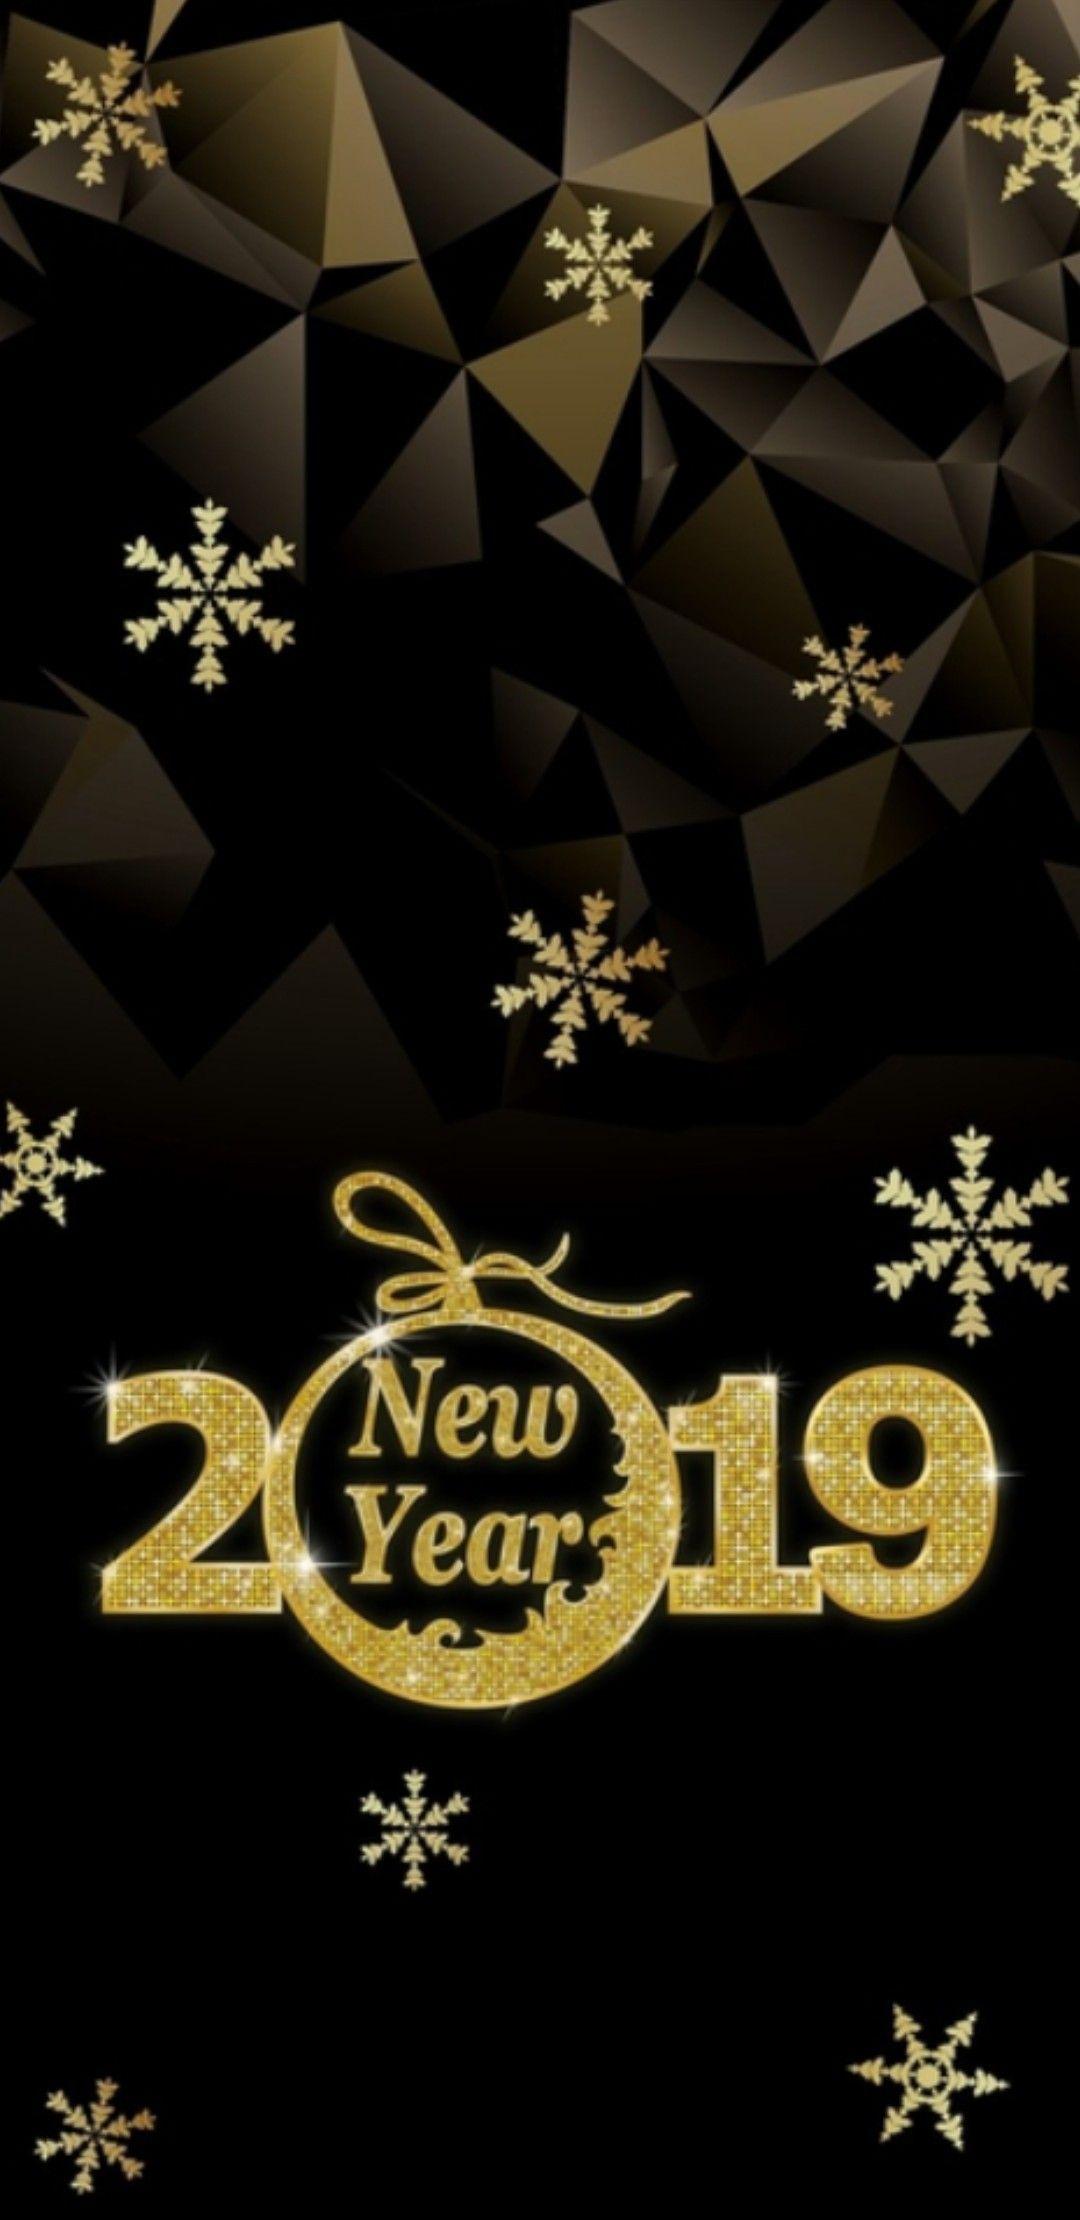 Happy New Year from Jonathan Alonso www.thejonathanalonso